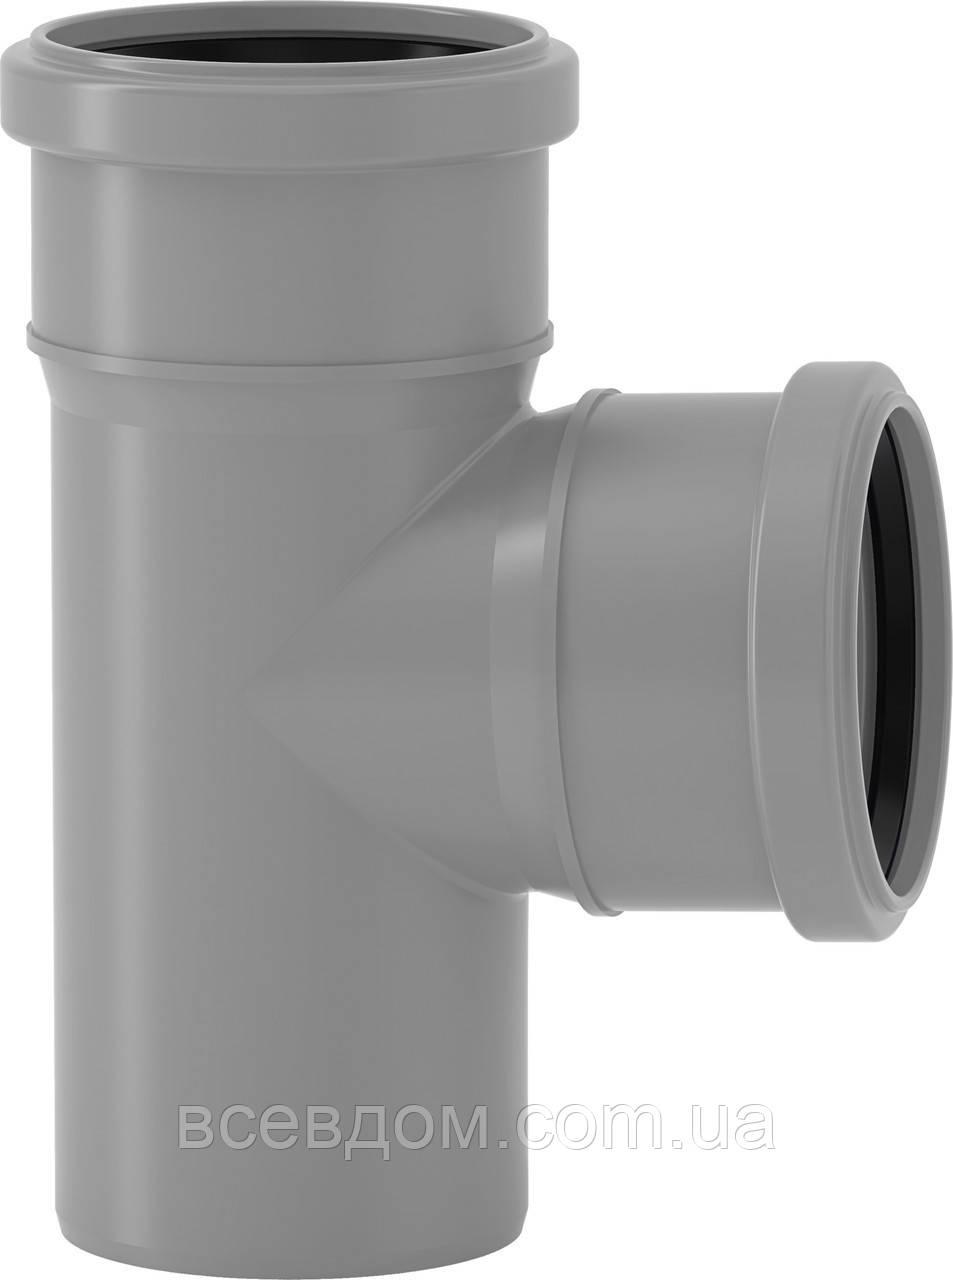 HTEA тройник Valsir внутренней канализации 50/50х87°